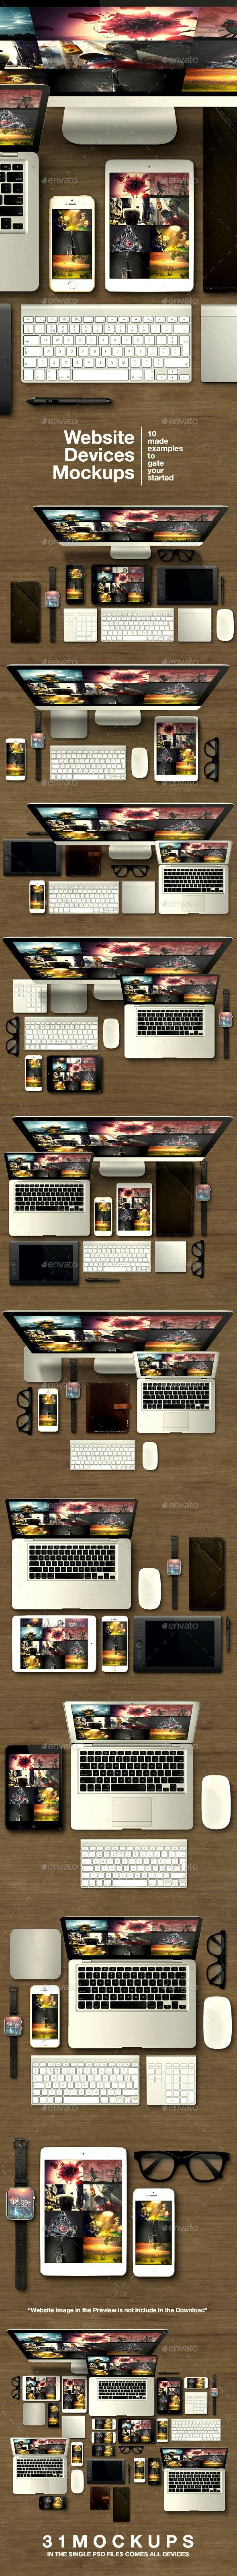 Website Devices Mockups - Website Displays